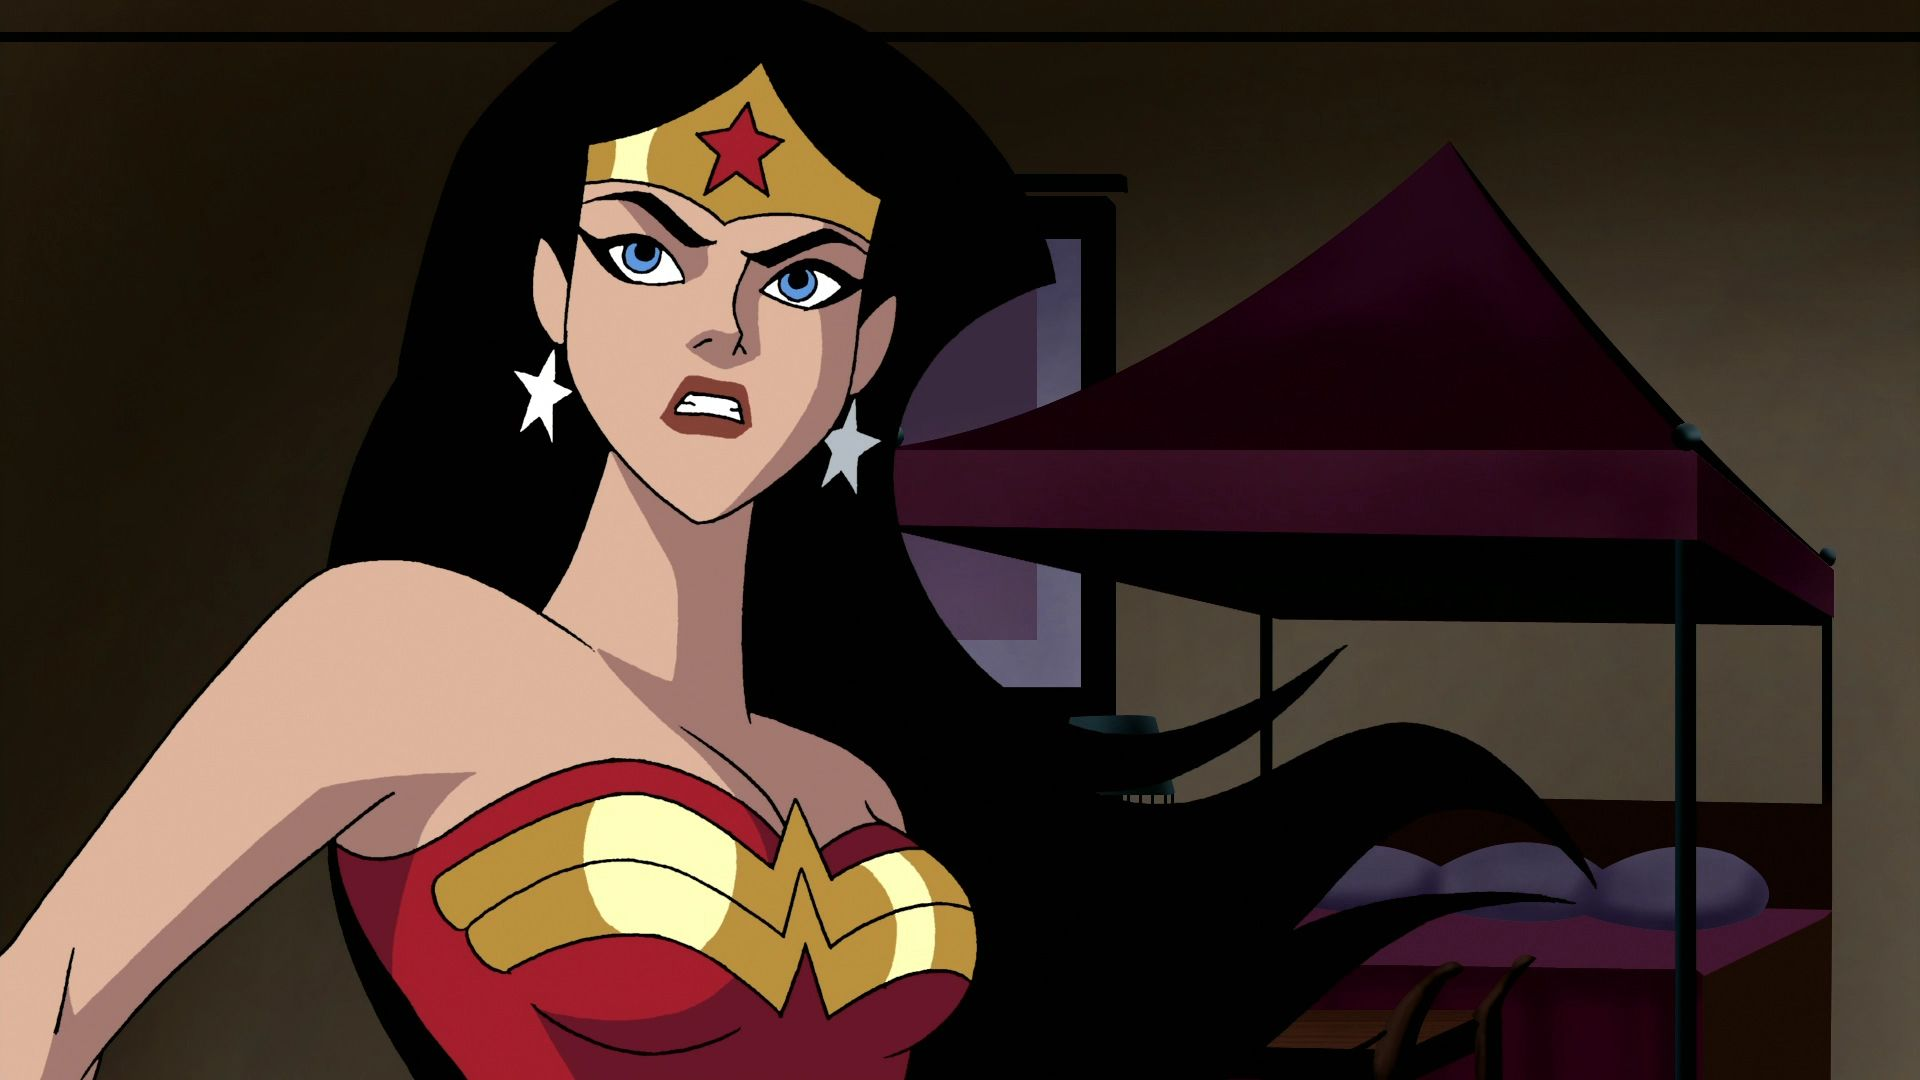 Wonder Woman Beaten Justice League Sleepy Comics - Justic...